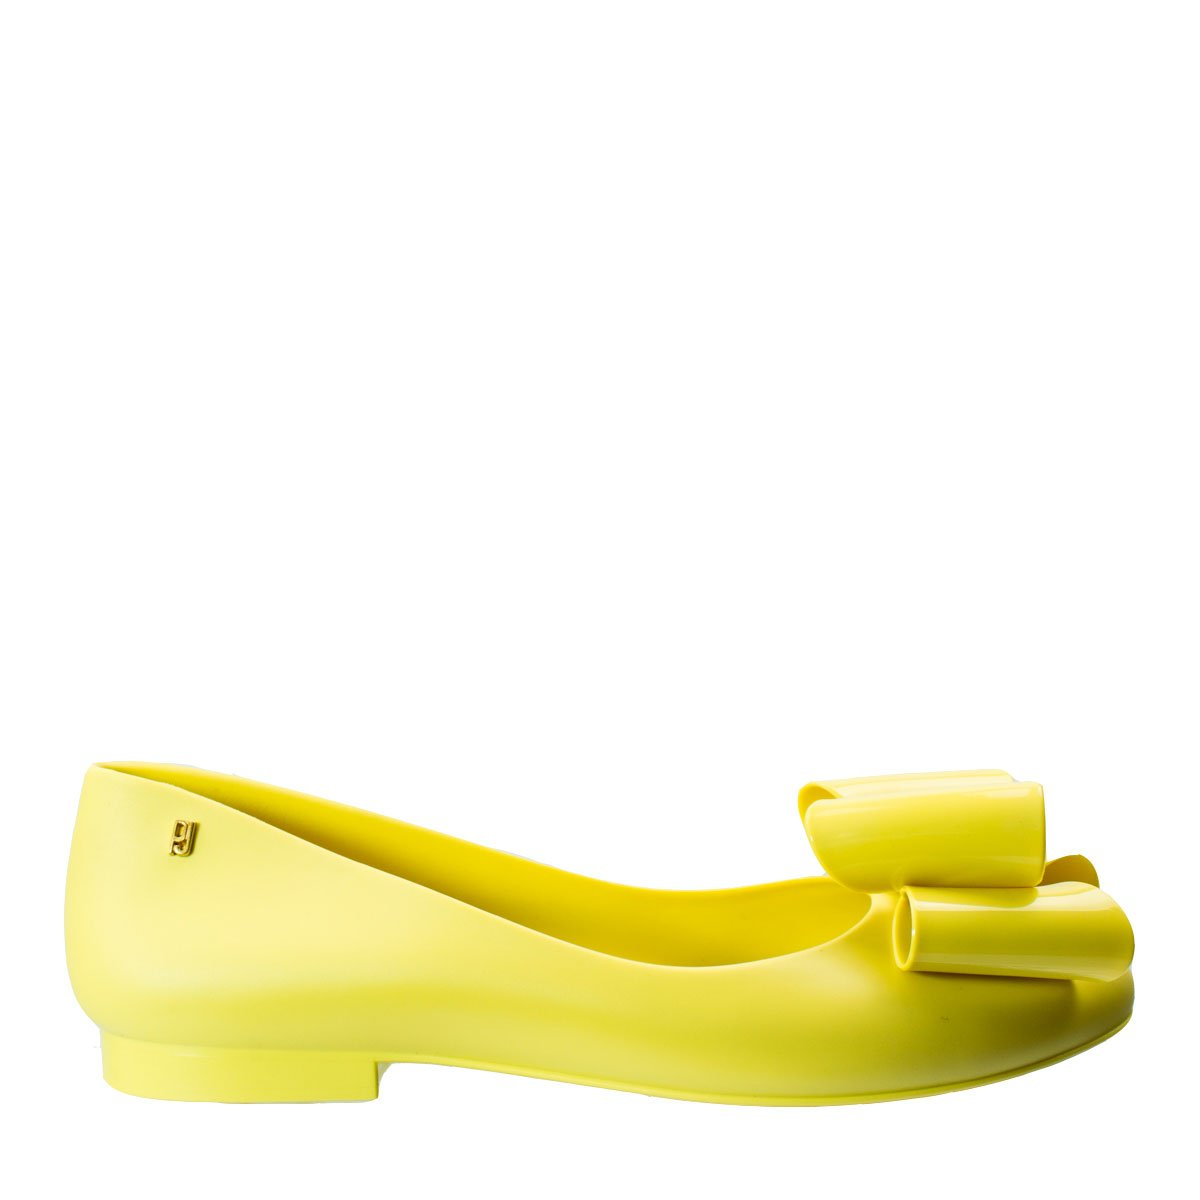 8a67544d2 Bizz Store - Sapatilha Feminina Petite Jolie PVC J-Lastic